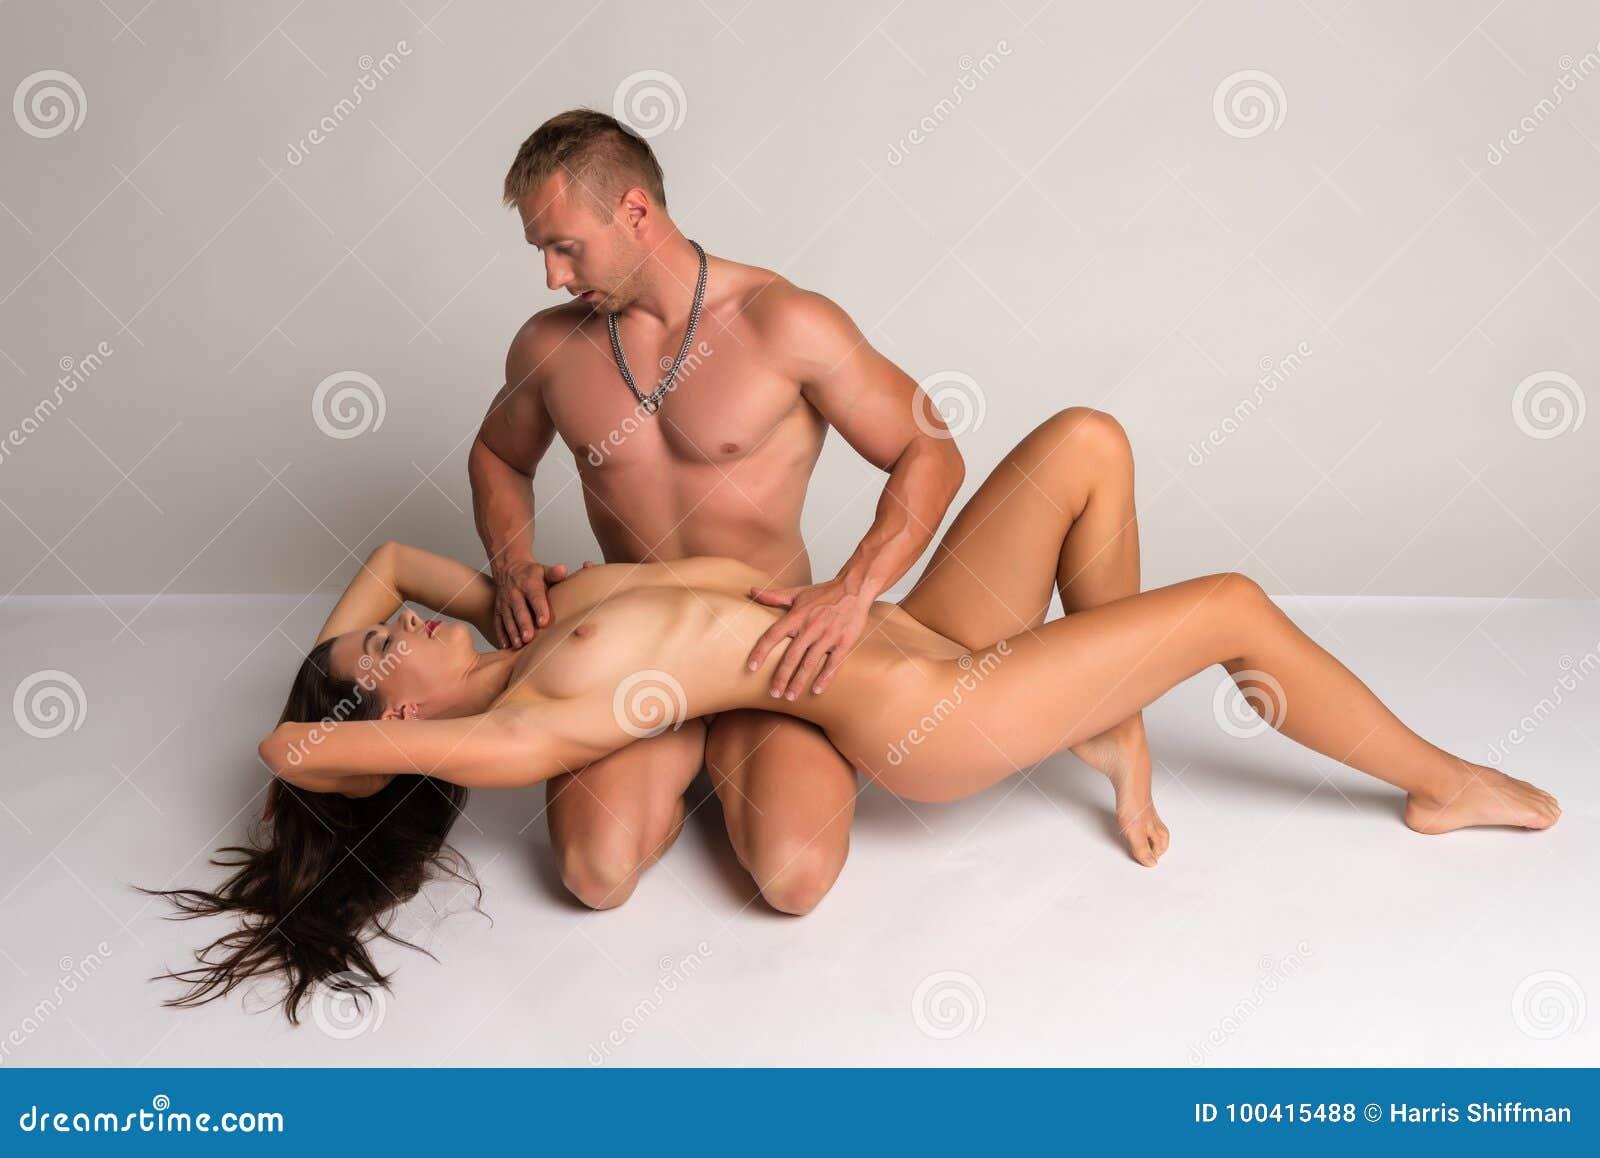 Pics couple nude Naked